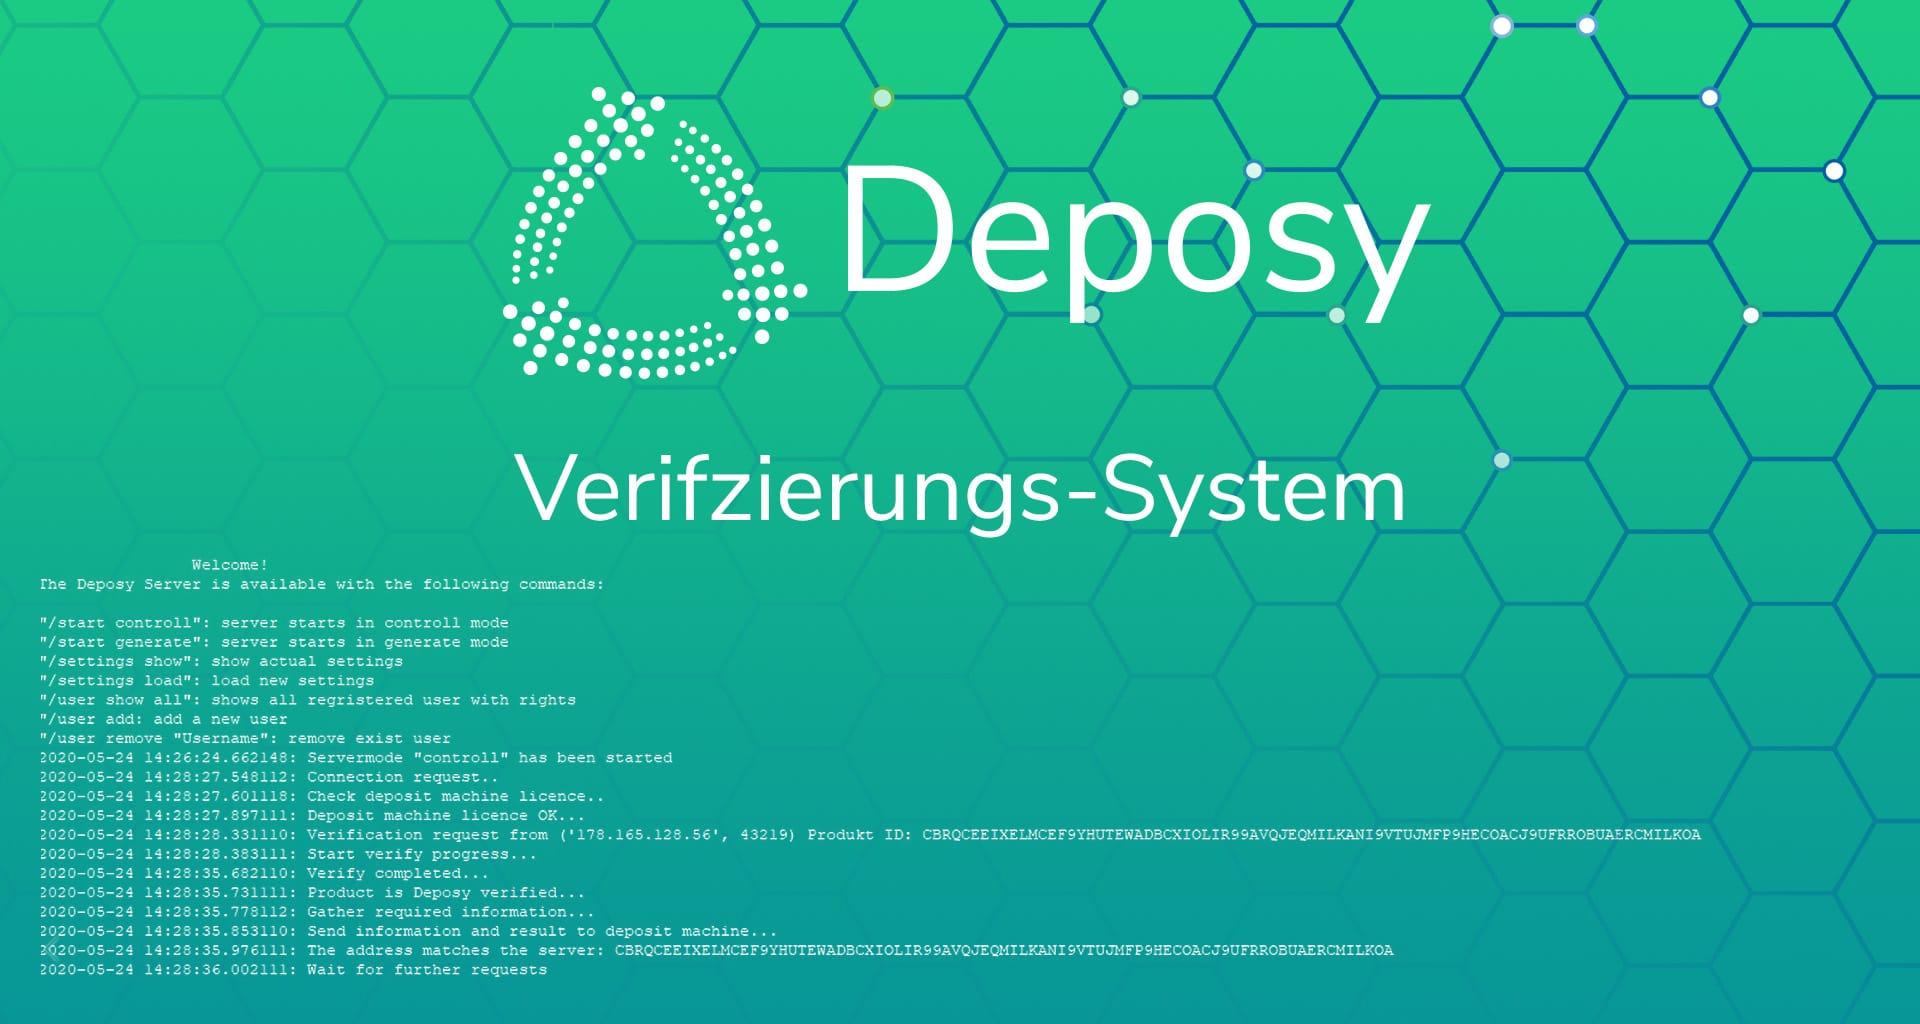 Deposy Verifizierungs System